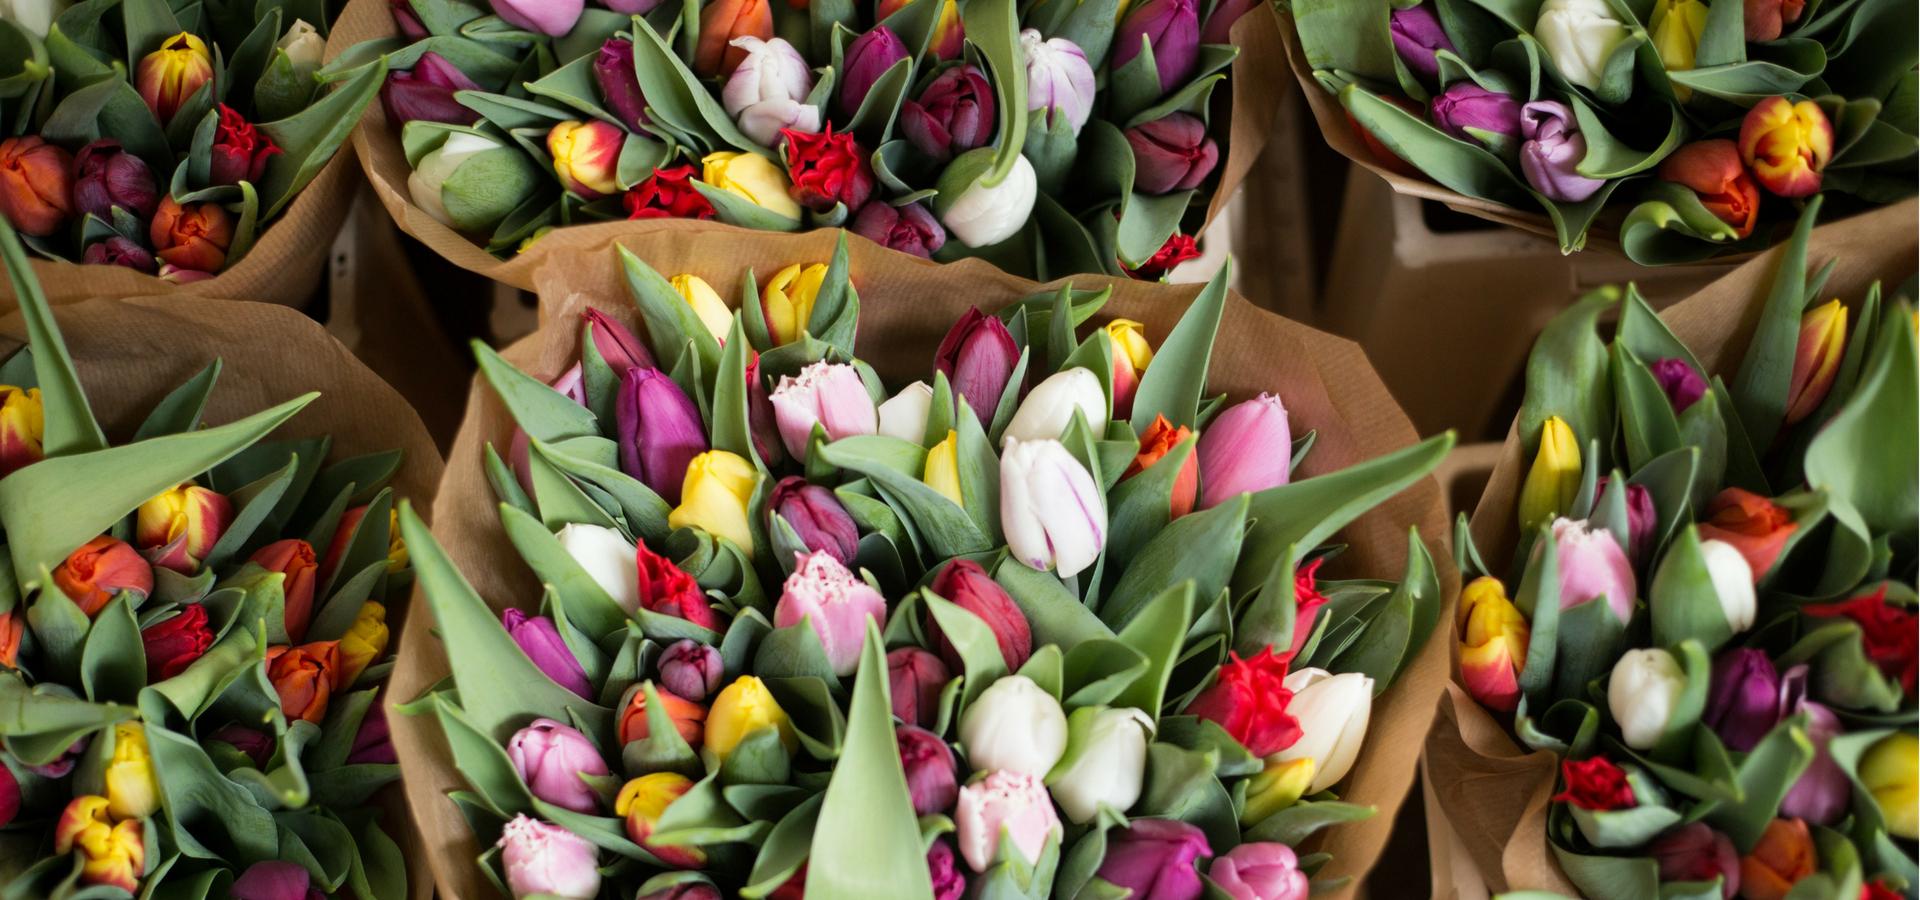 Nottingham Florist